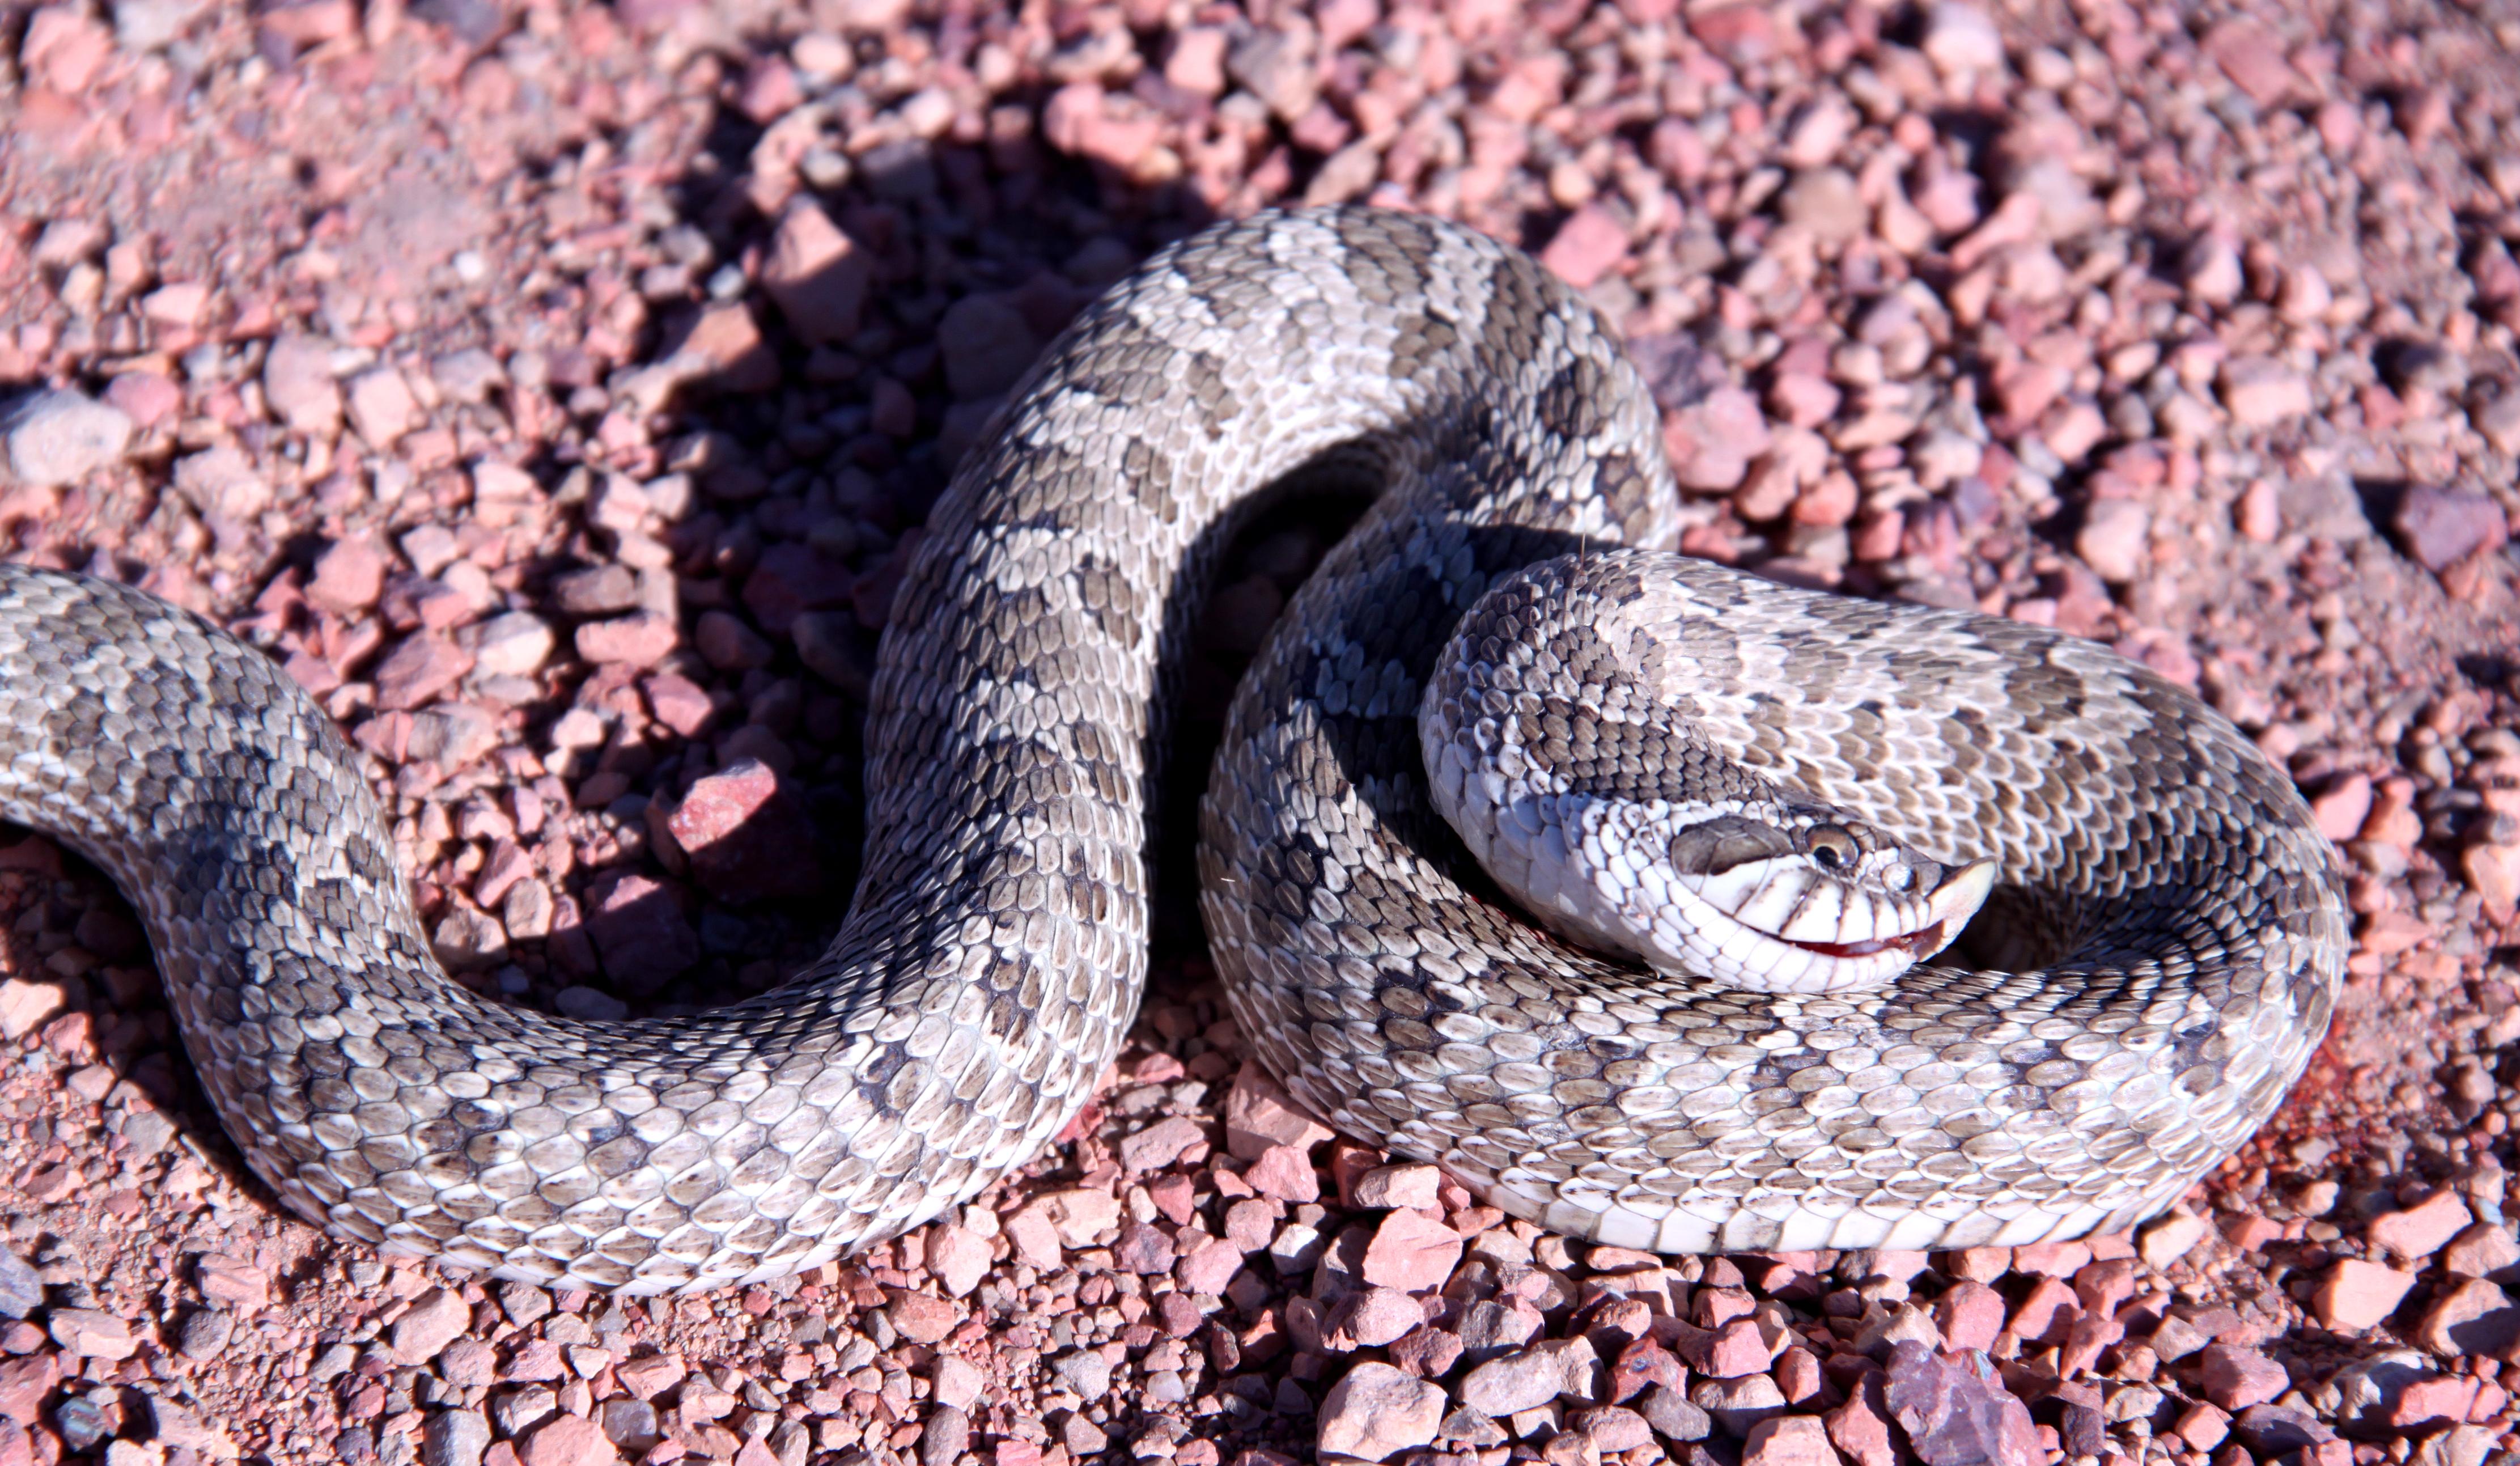 Western hognose snake, Thunder Basin National Grassland